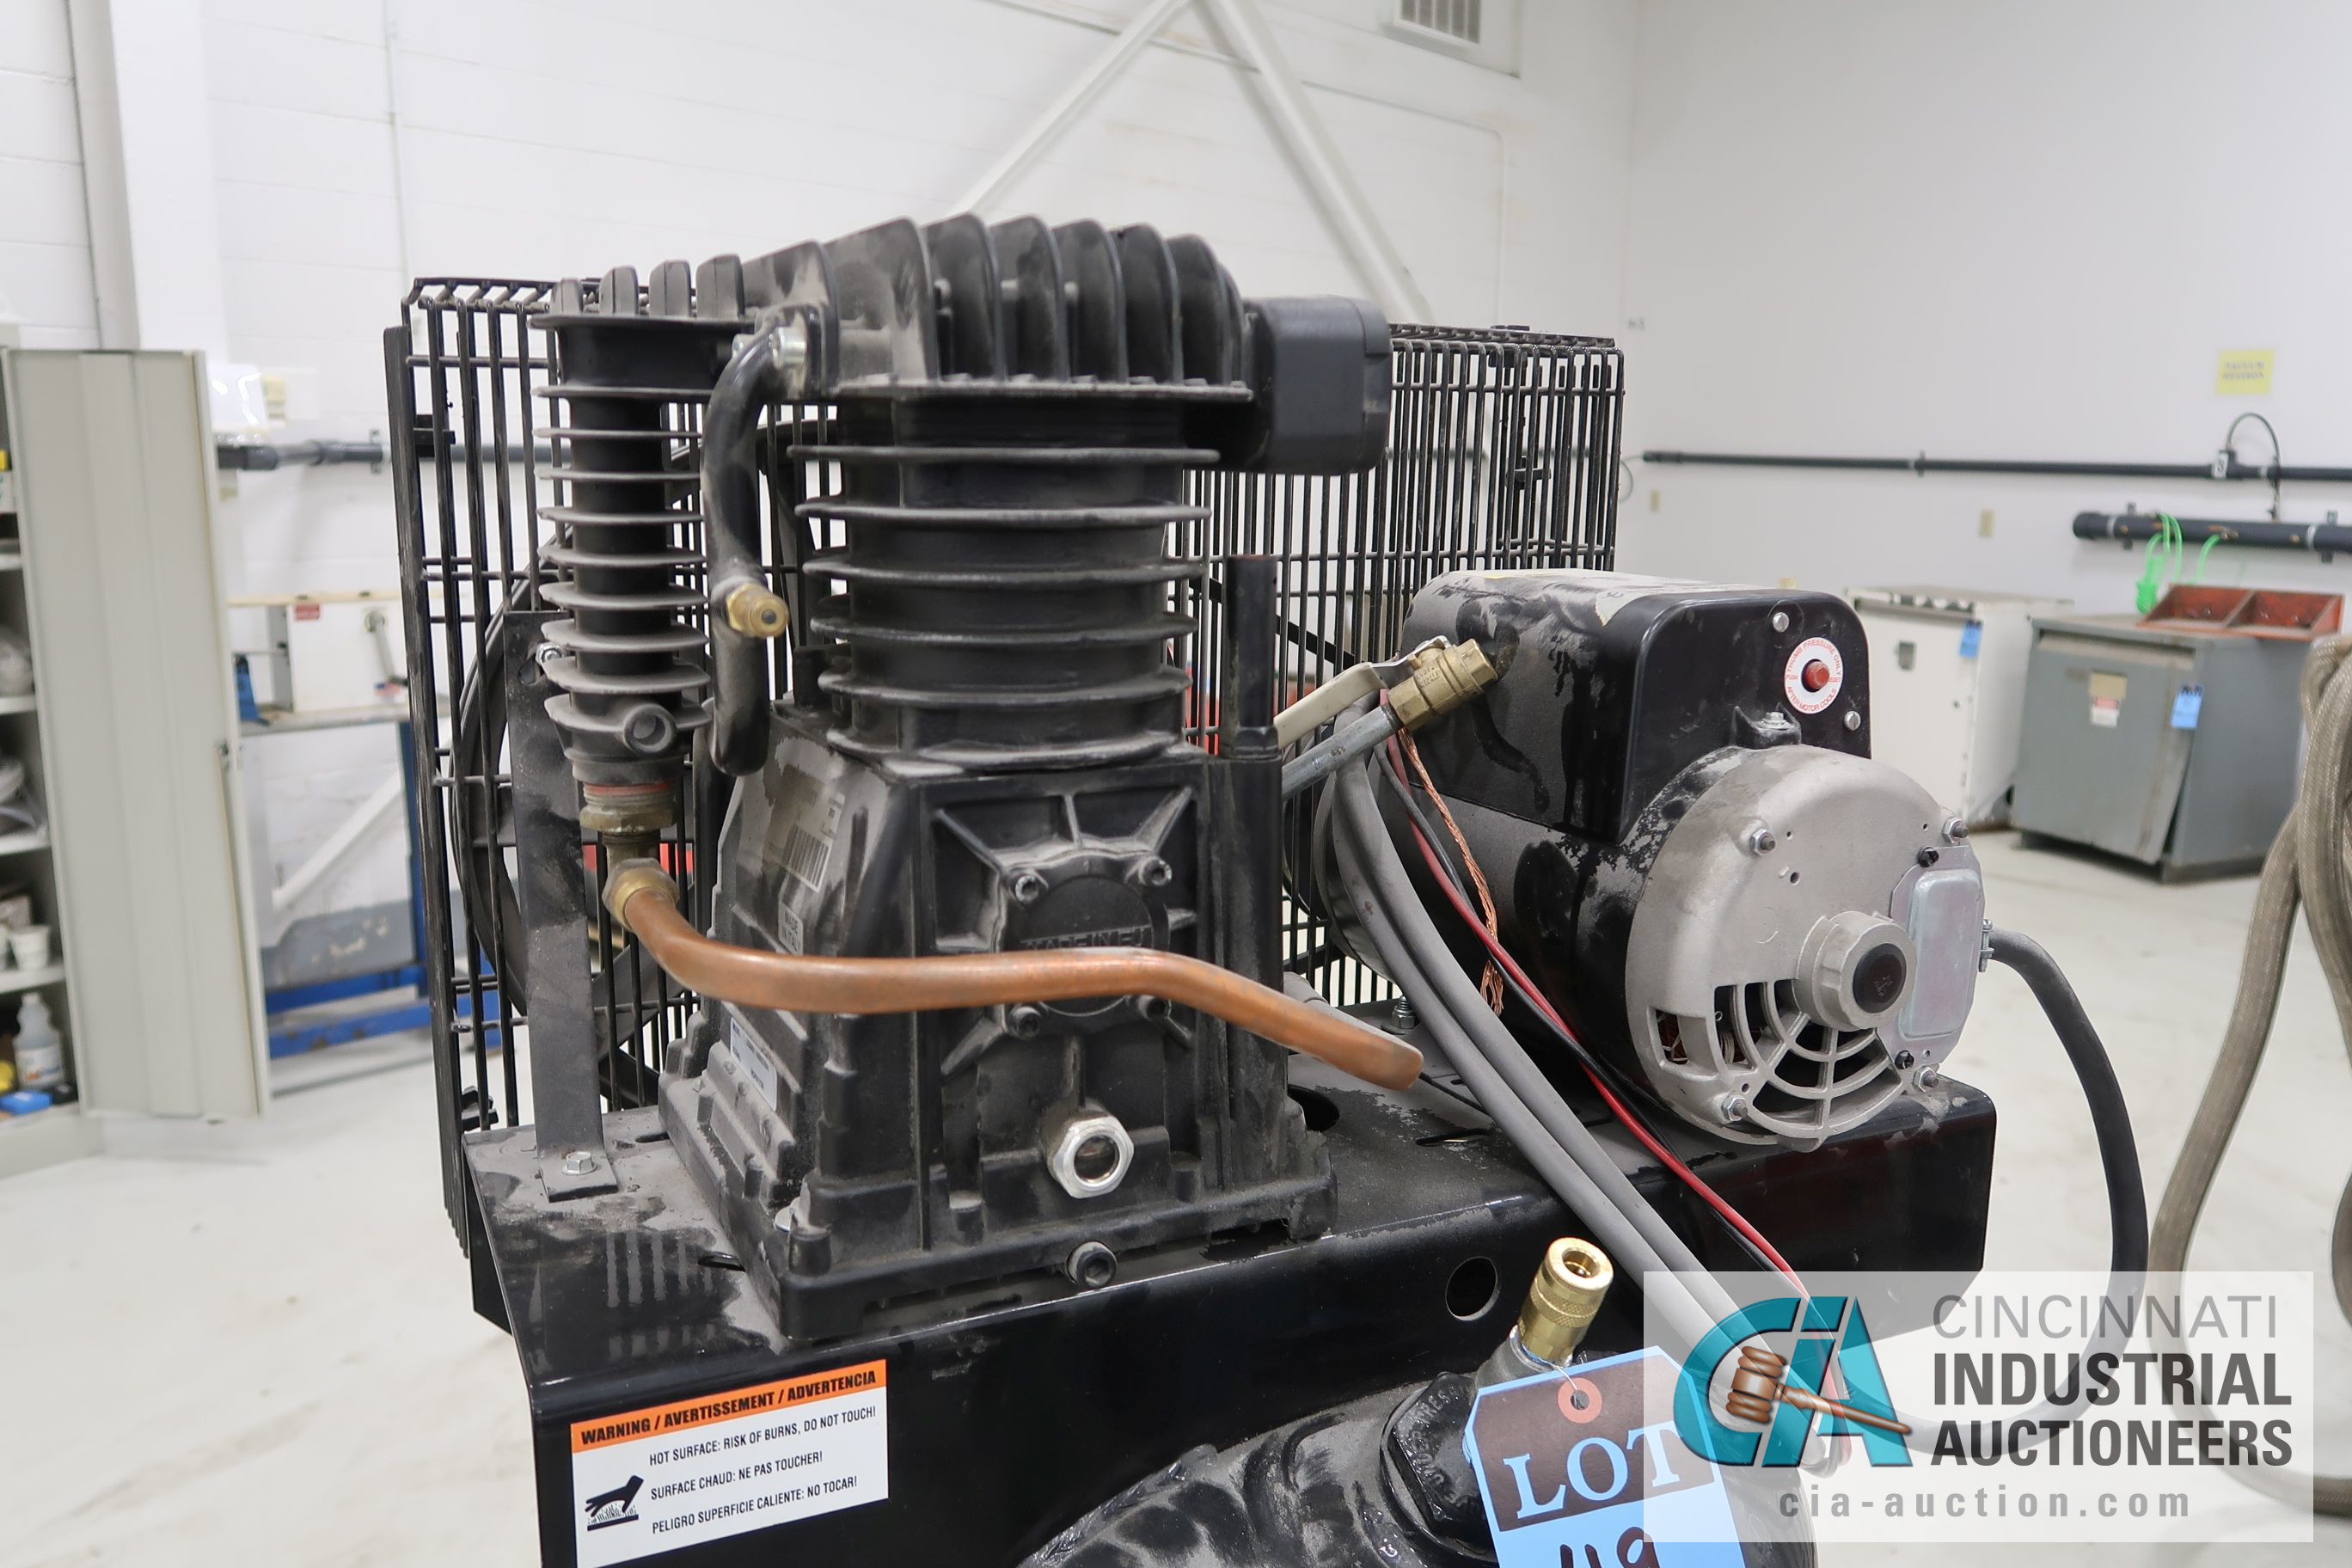 5 HP US GENERAL HORIZONTAL TANK MOUNTED AIR COMPRESSOR, 60 GAL. TANK, 230 VOLT - Image 4 of 4